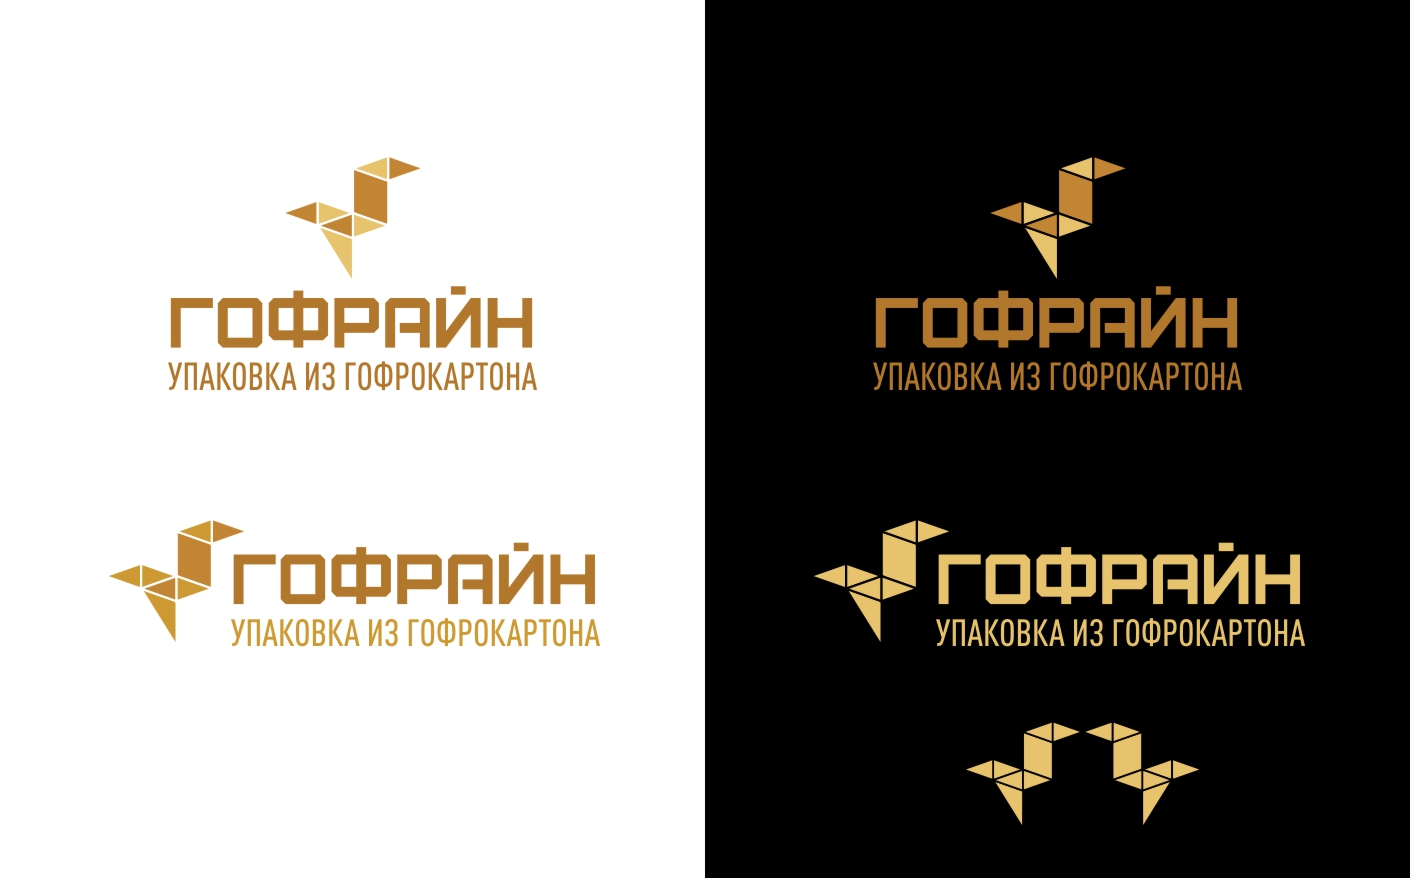 Логотип для компании по реализации упаковки из гофрокартона фото f_4475cdec725817c6.jpg